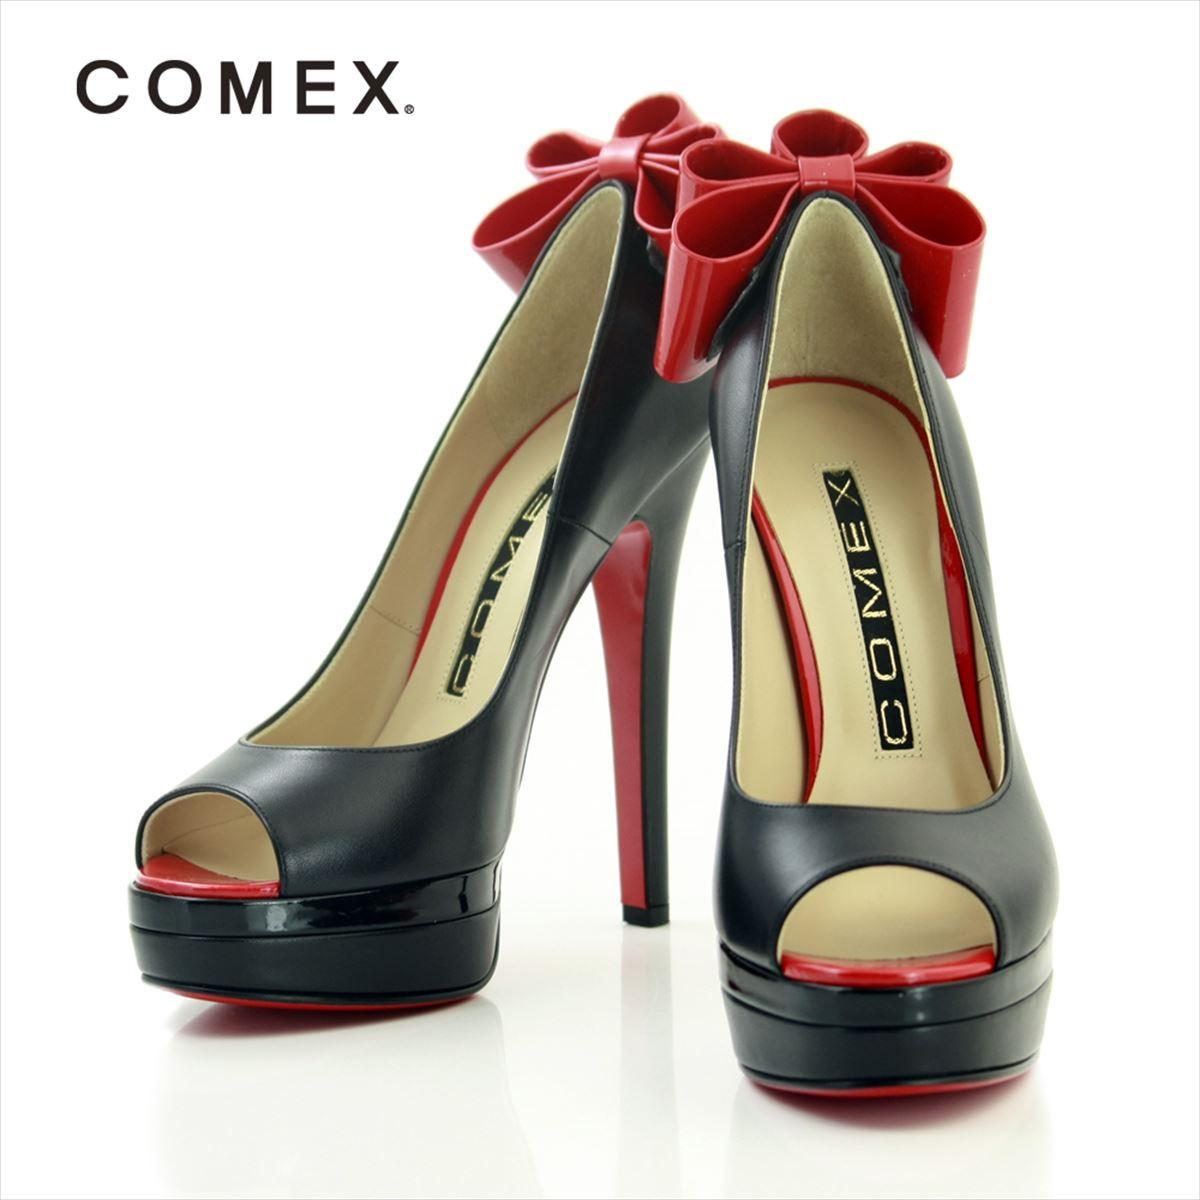 COMEX コメックス パンプス パーティ ハイヒール オープントゥ ピンヒール リボン